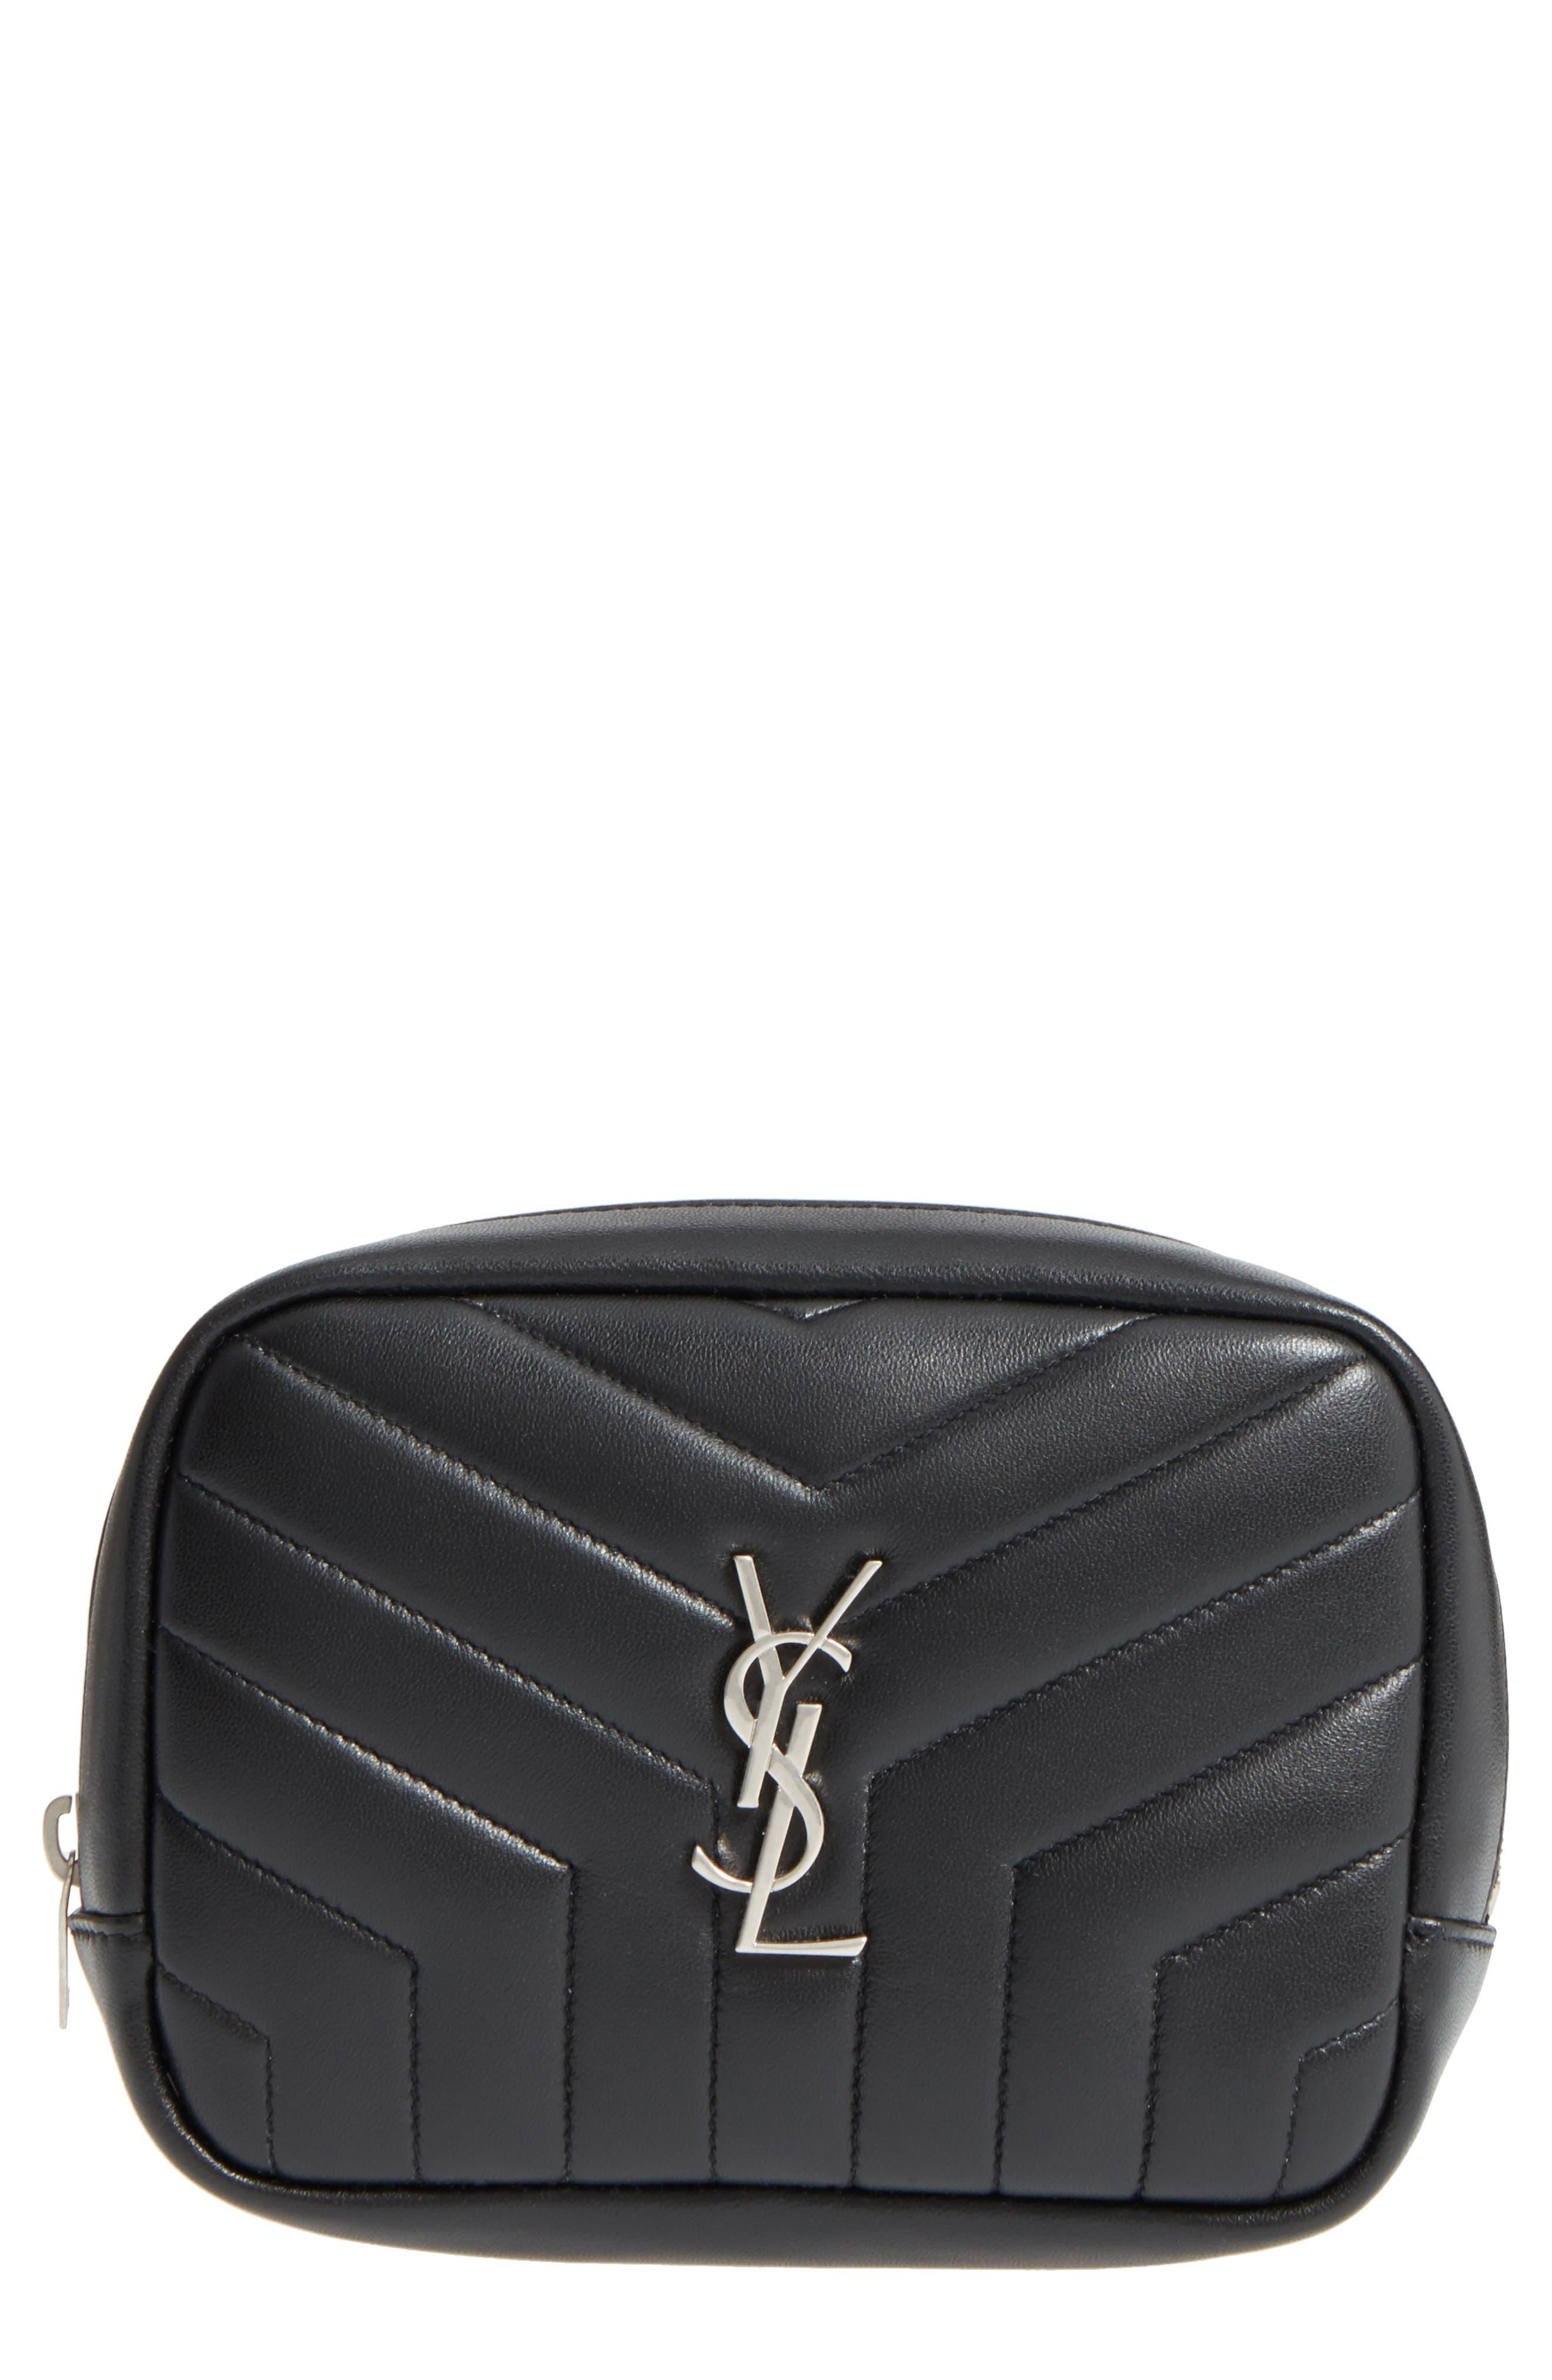 Loulou Matelassé Leather Cosmetics Bag,                             Main thumbnail 1, color,                             BLACK